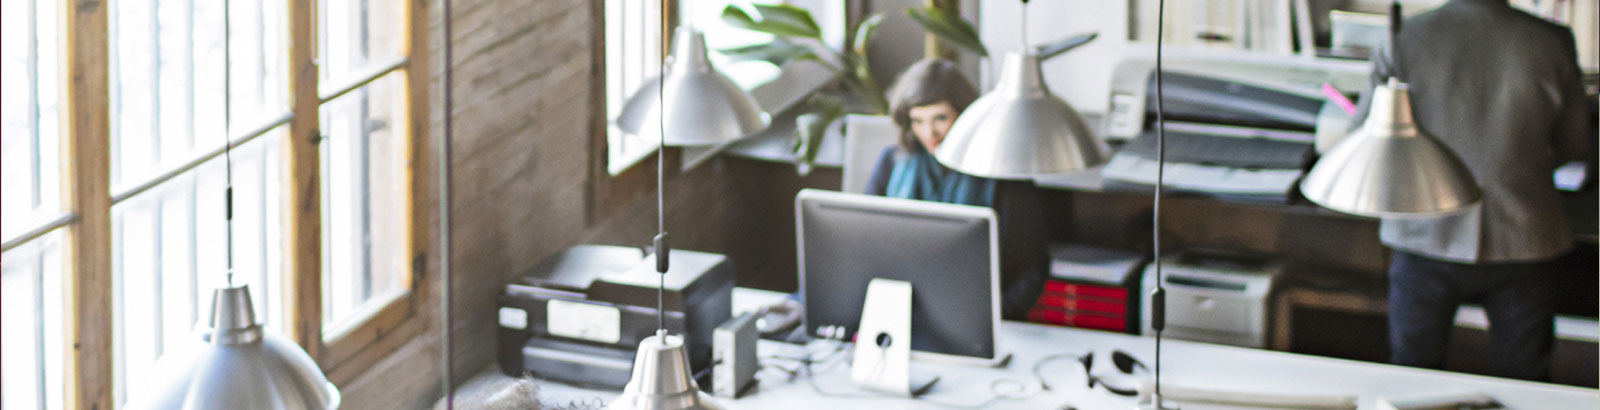 gestion de paye en marque blanche cabinet expert comptable